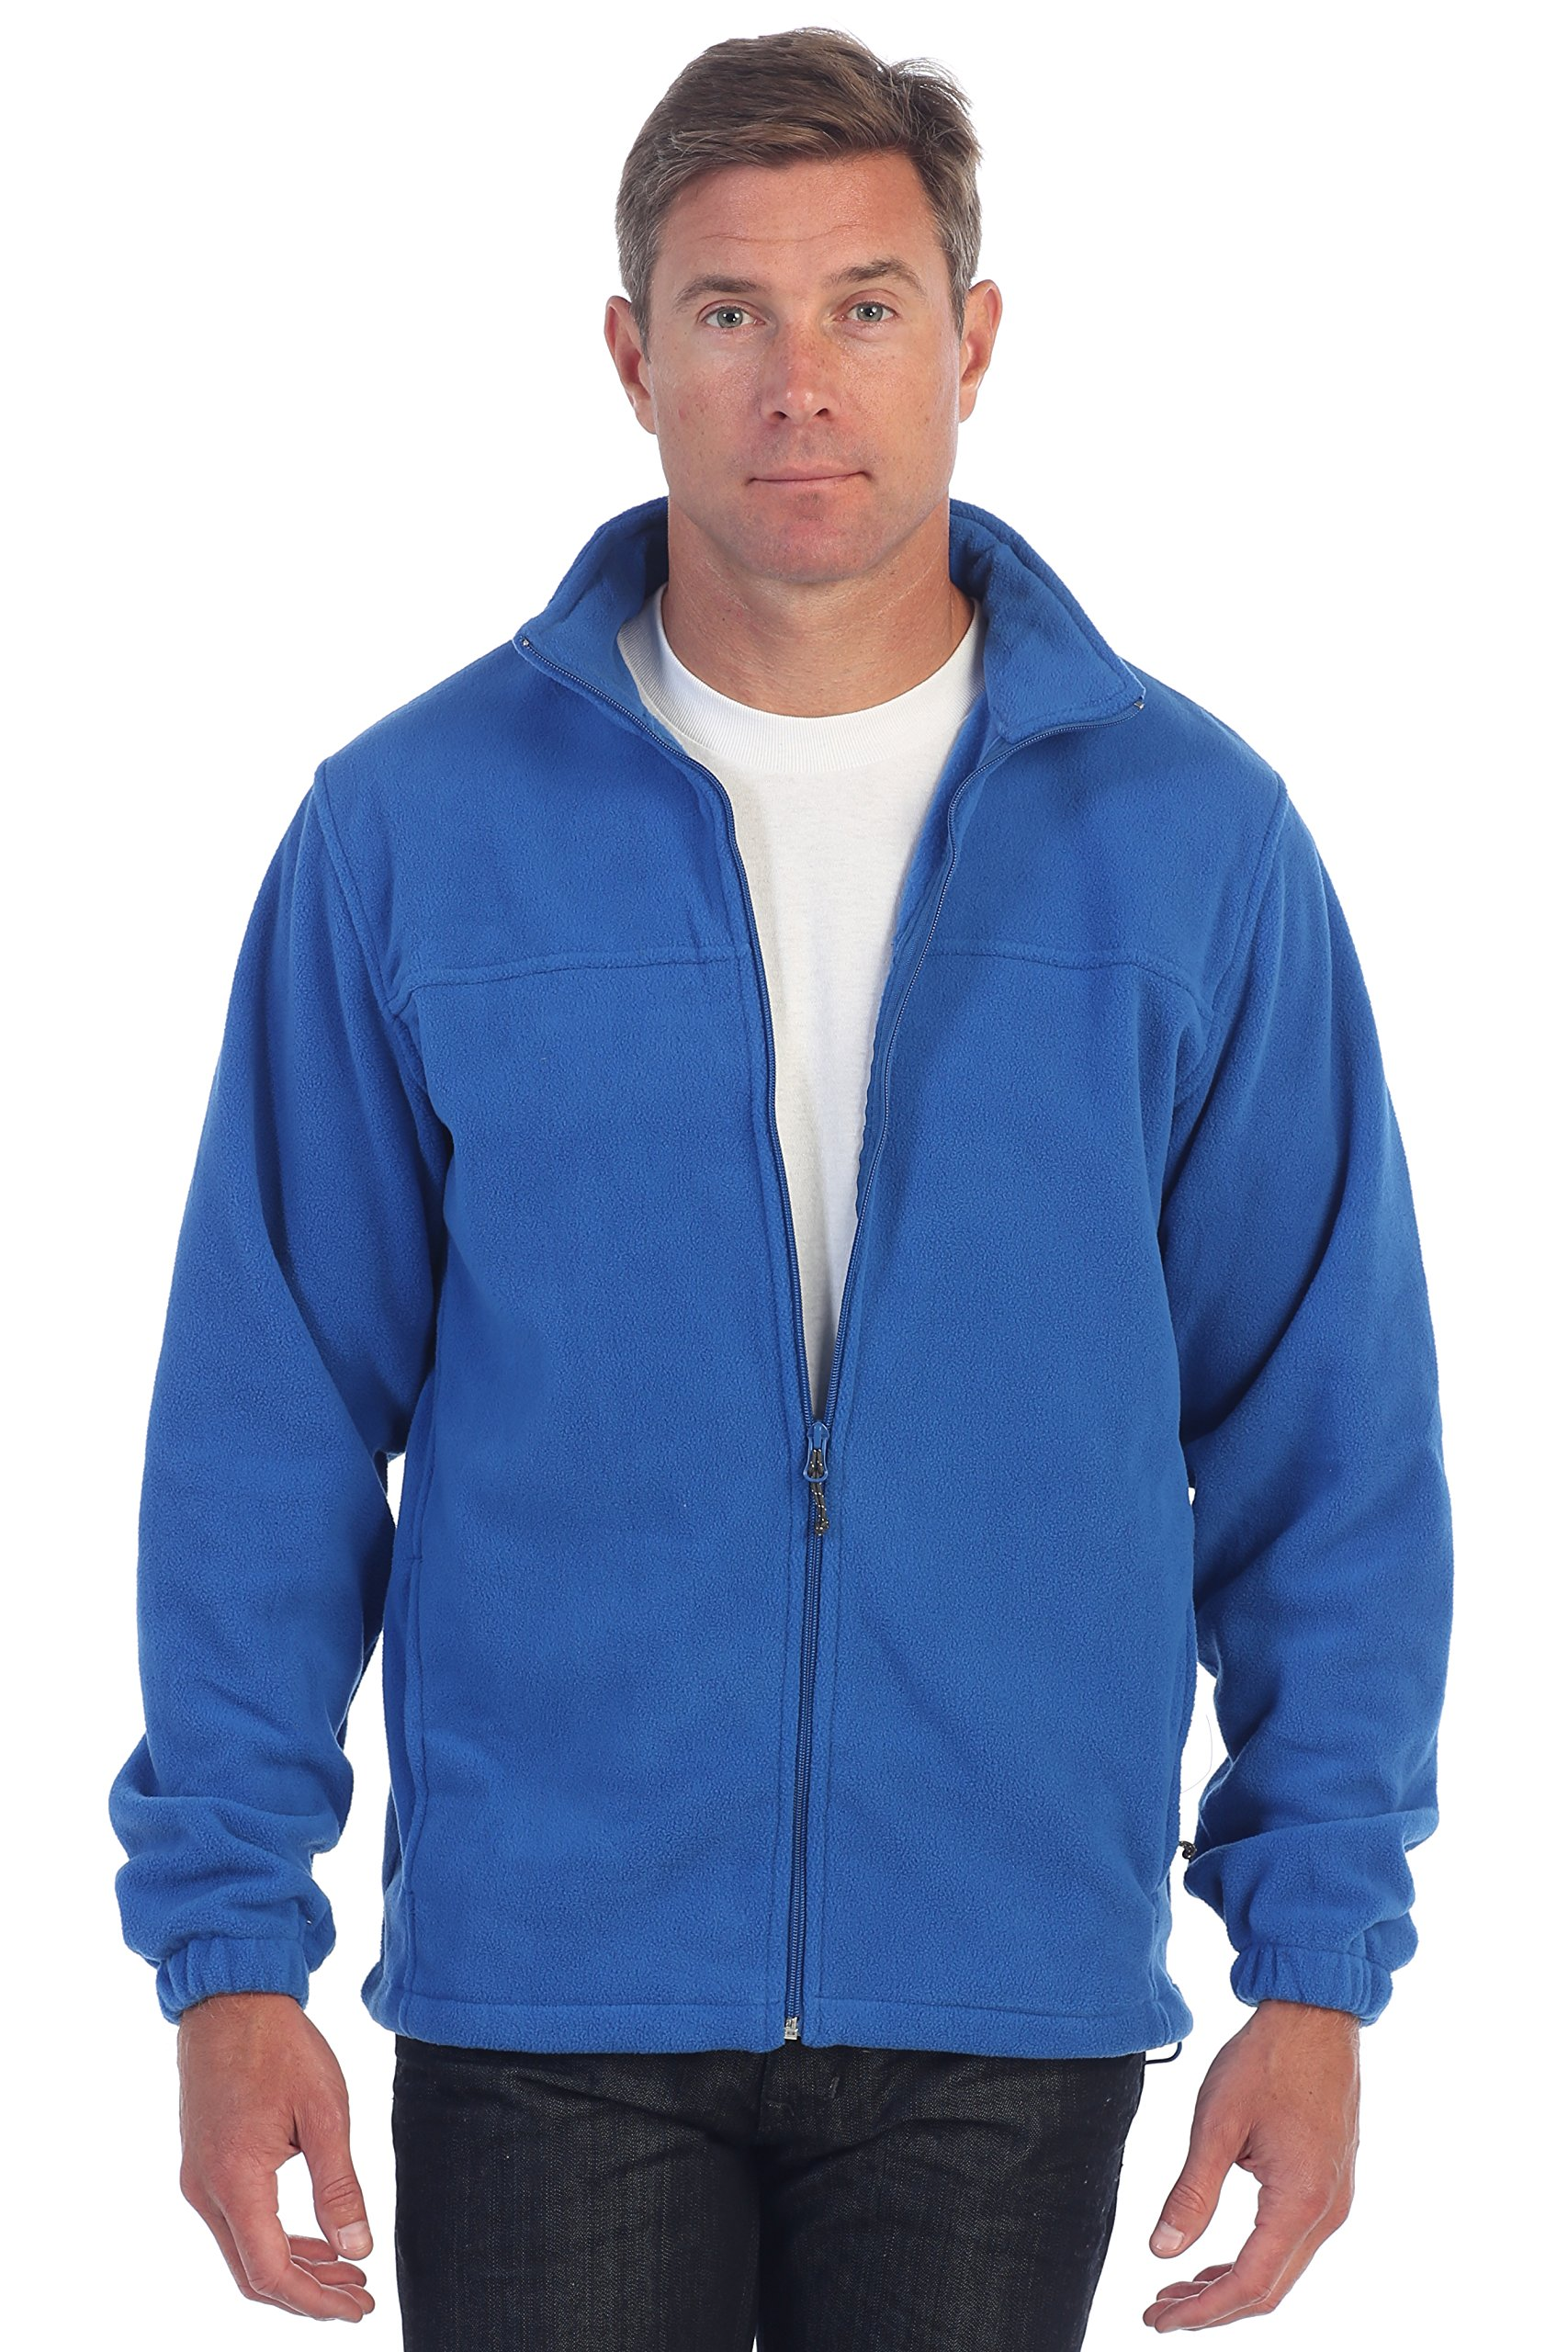 Gioberti Mens Full Zip Polar Fleece Jacket, Royal Blue, X-Large